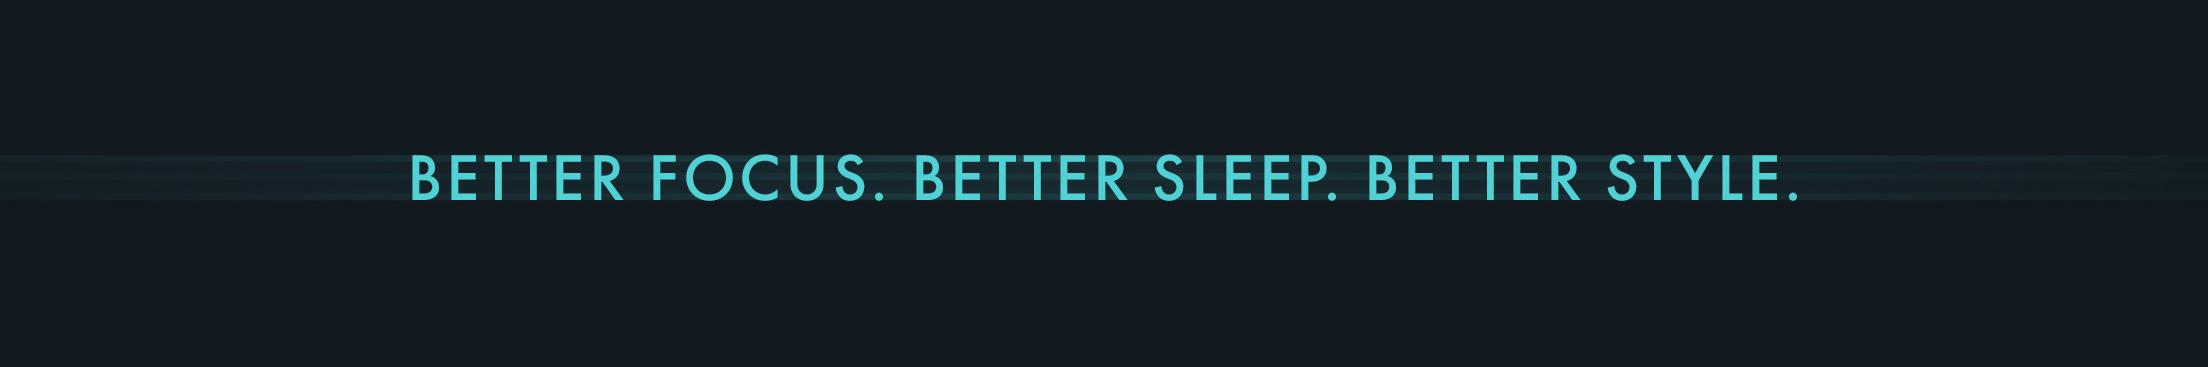 Better focus. Better sleep. Better style.